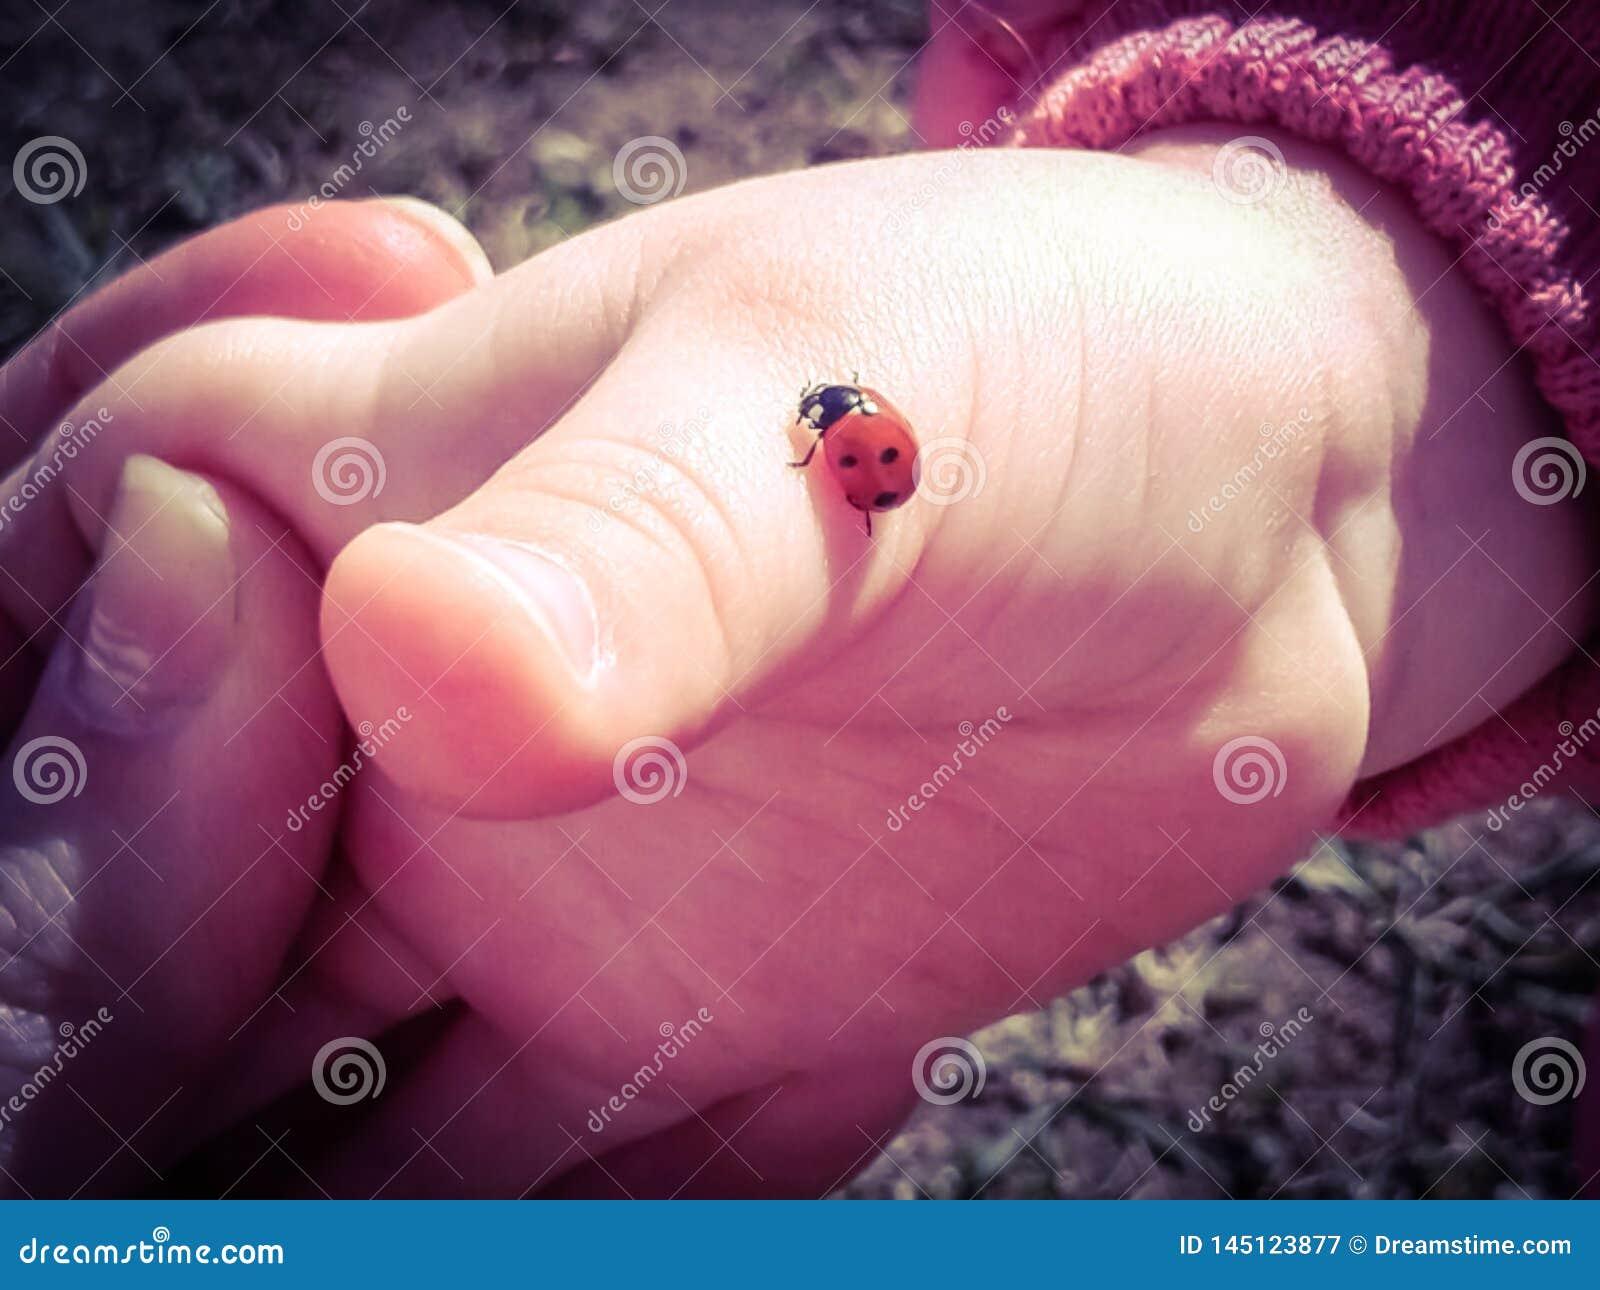 Baby hand and ladybug creeping up